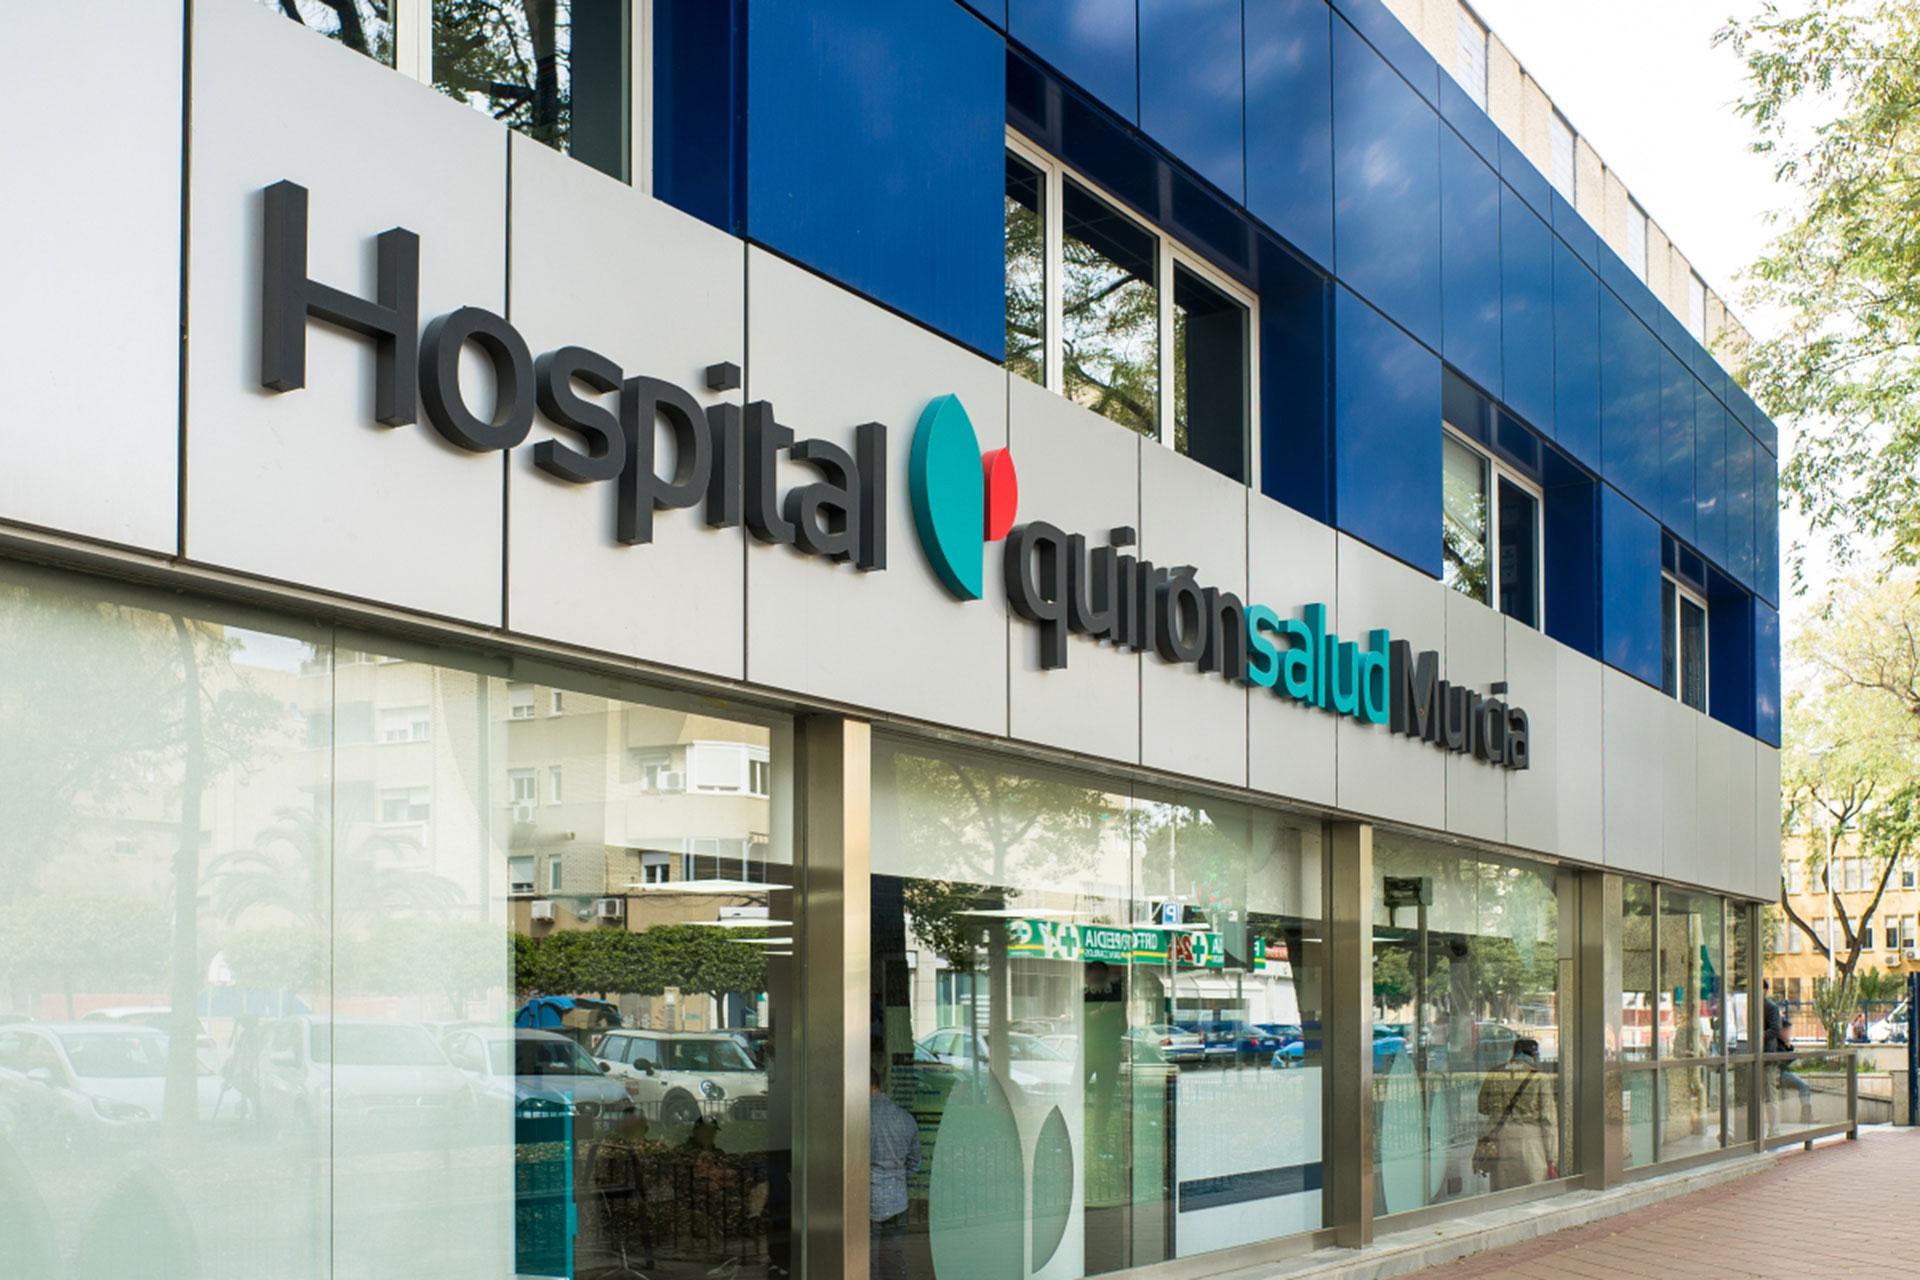 hospital marbella